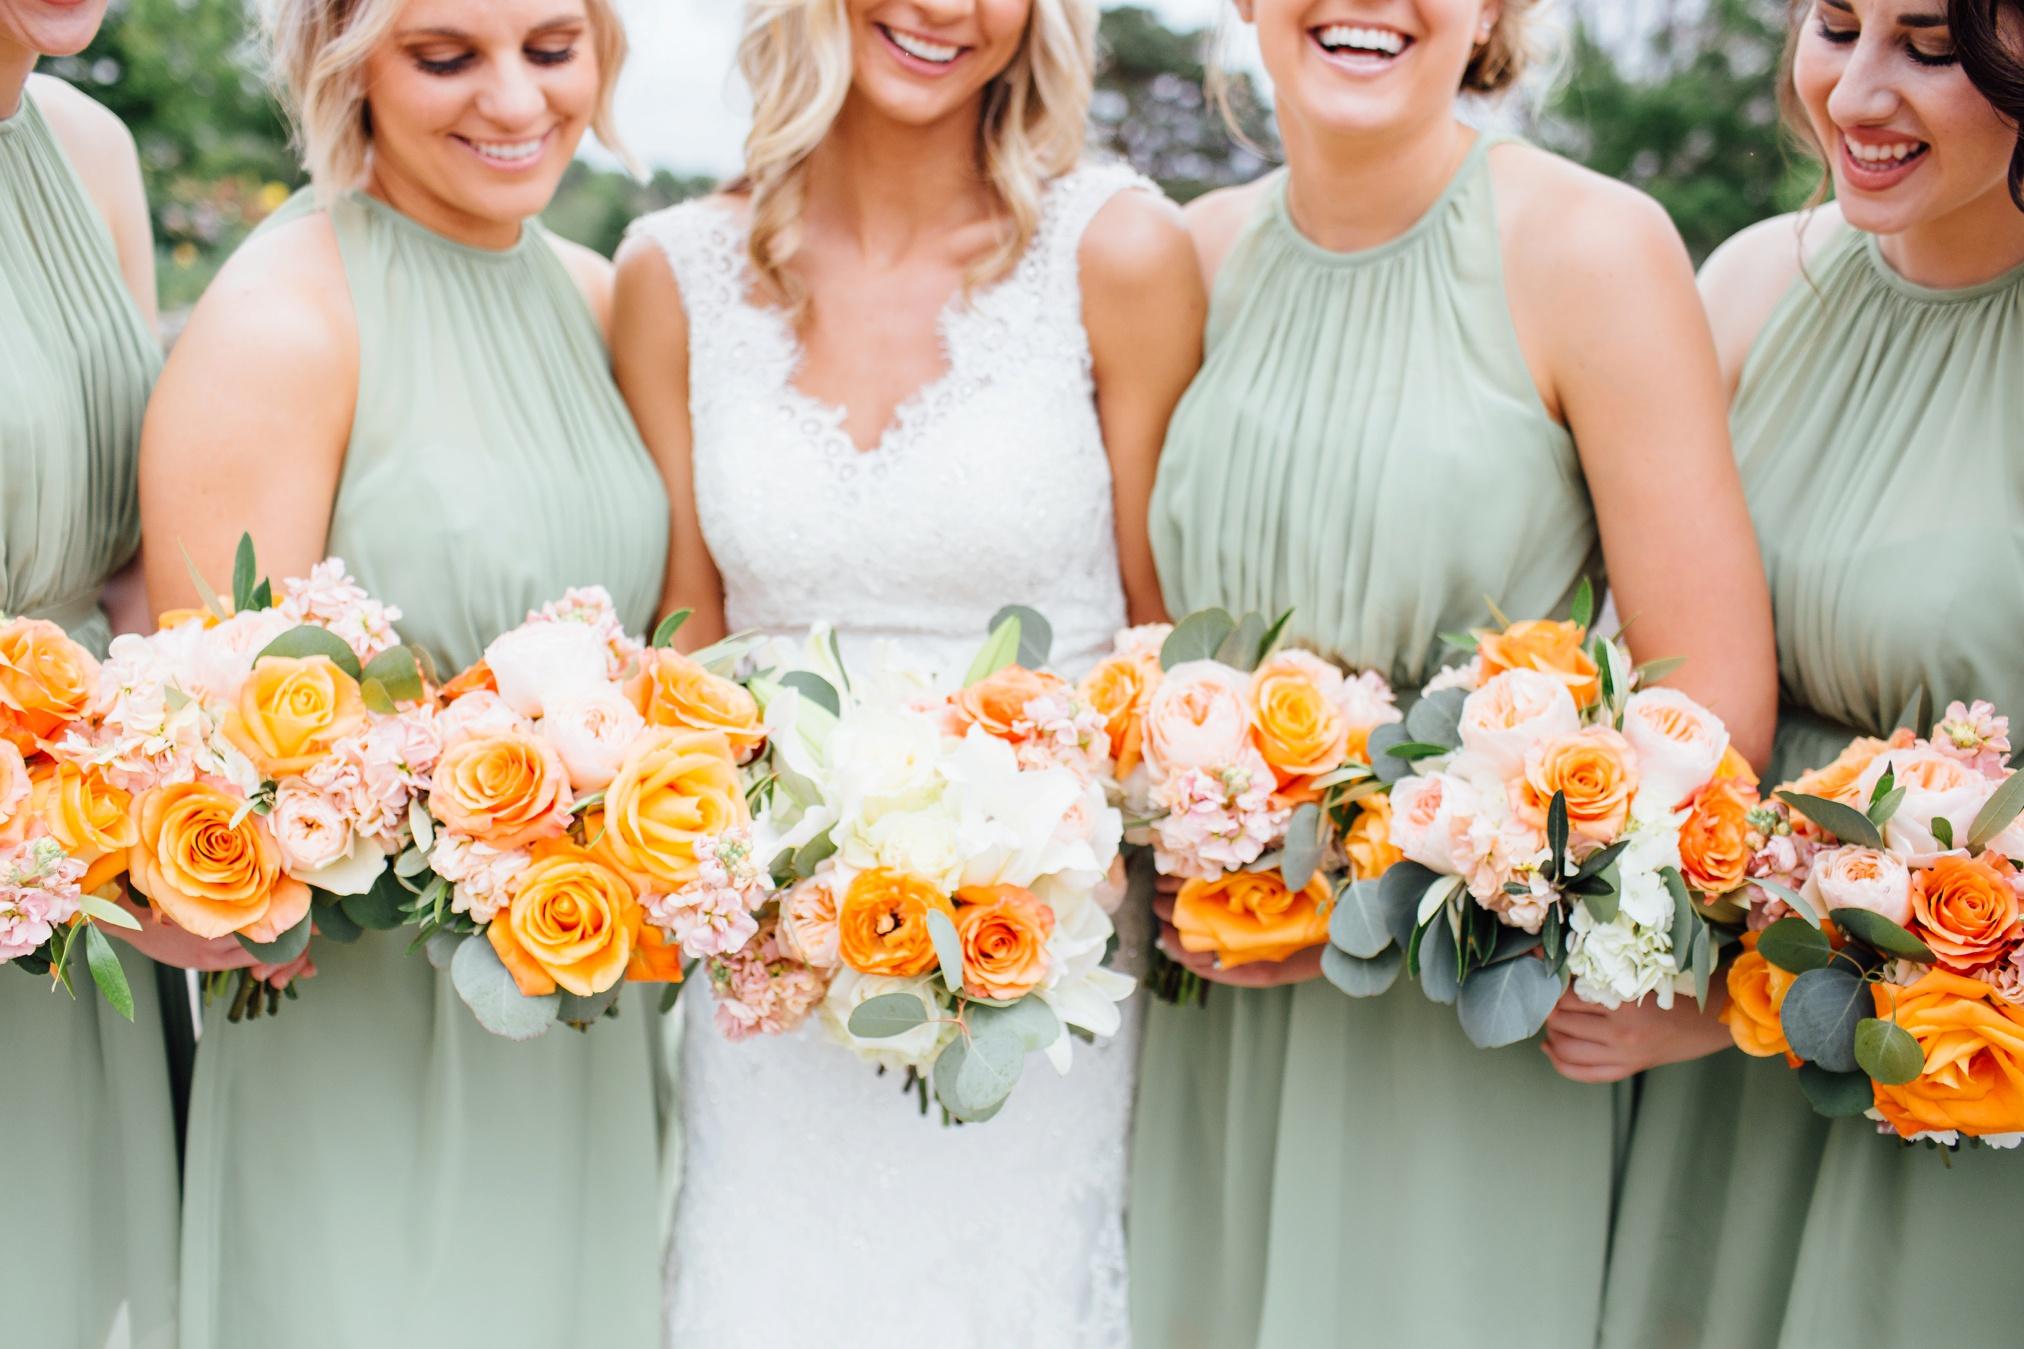 schmid_wedding-130.jpg